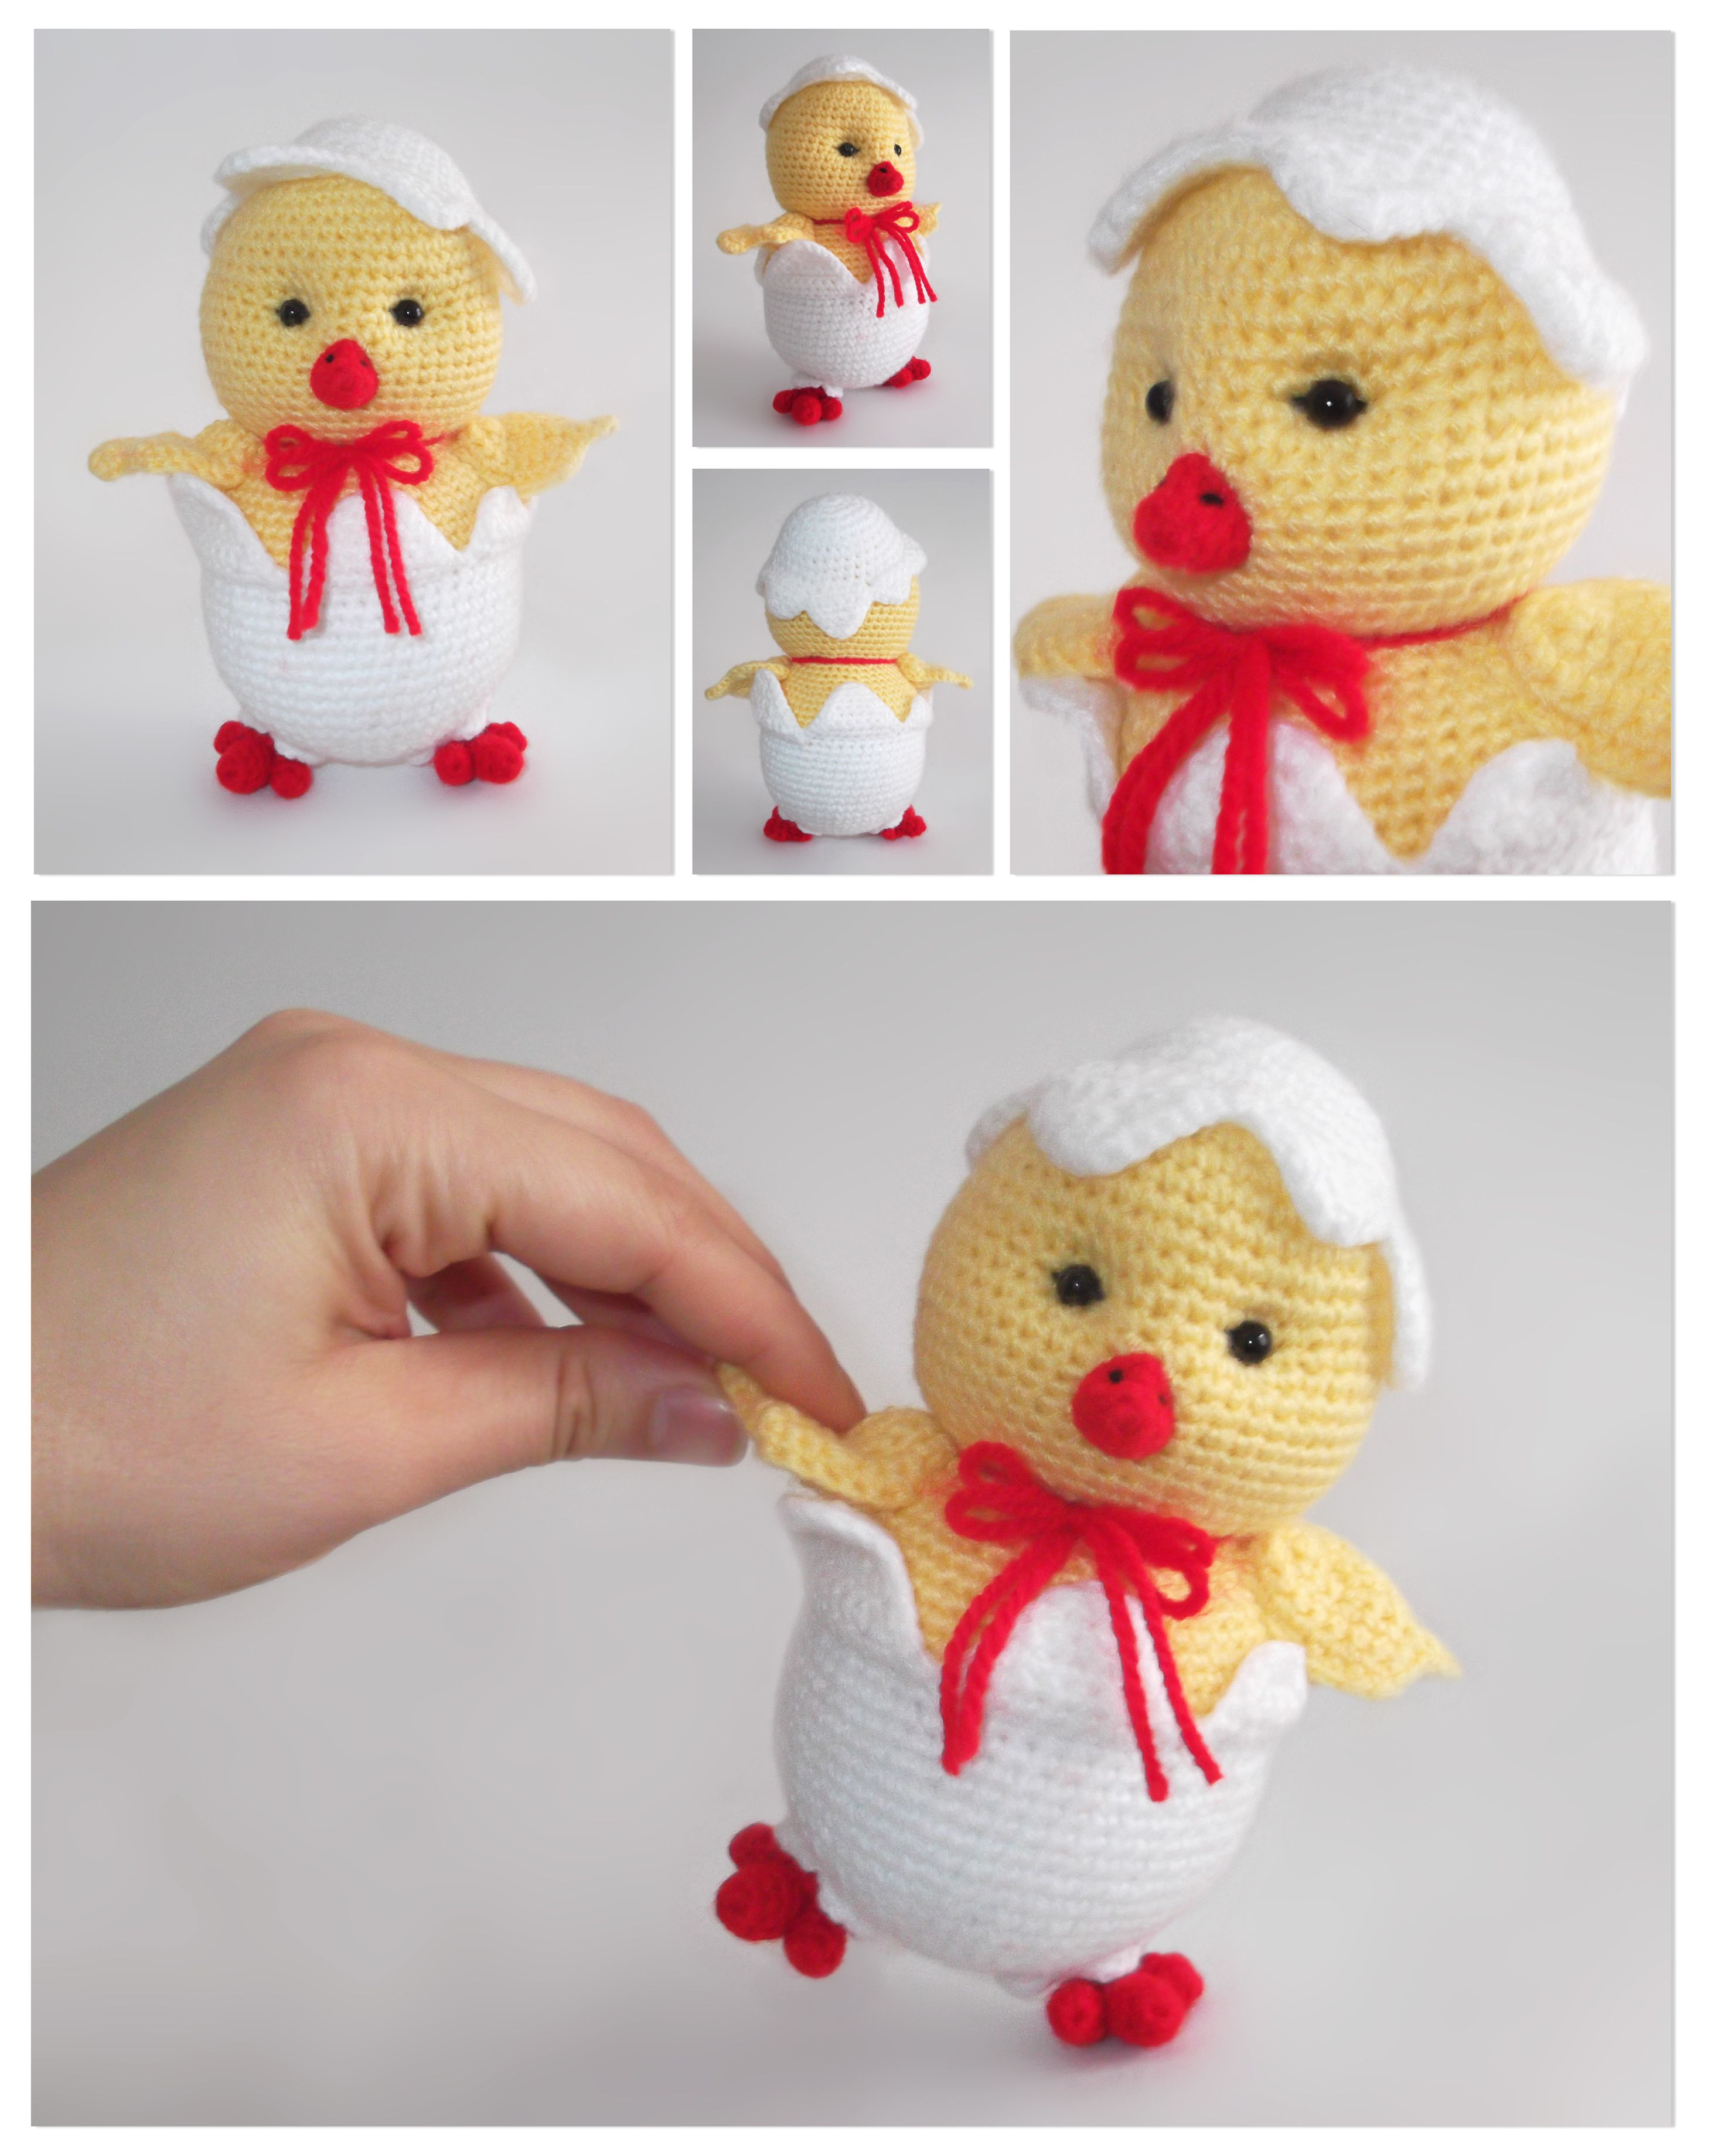 Crochet Baby Chick | ente und huhn | Pinterest | Ganchillo, Patrones ...